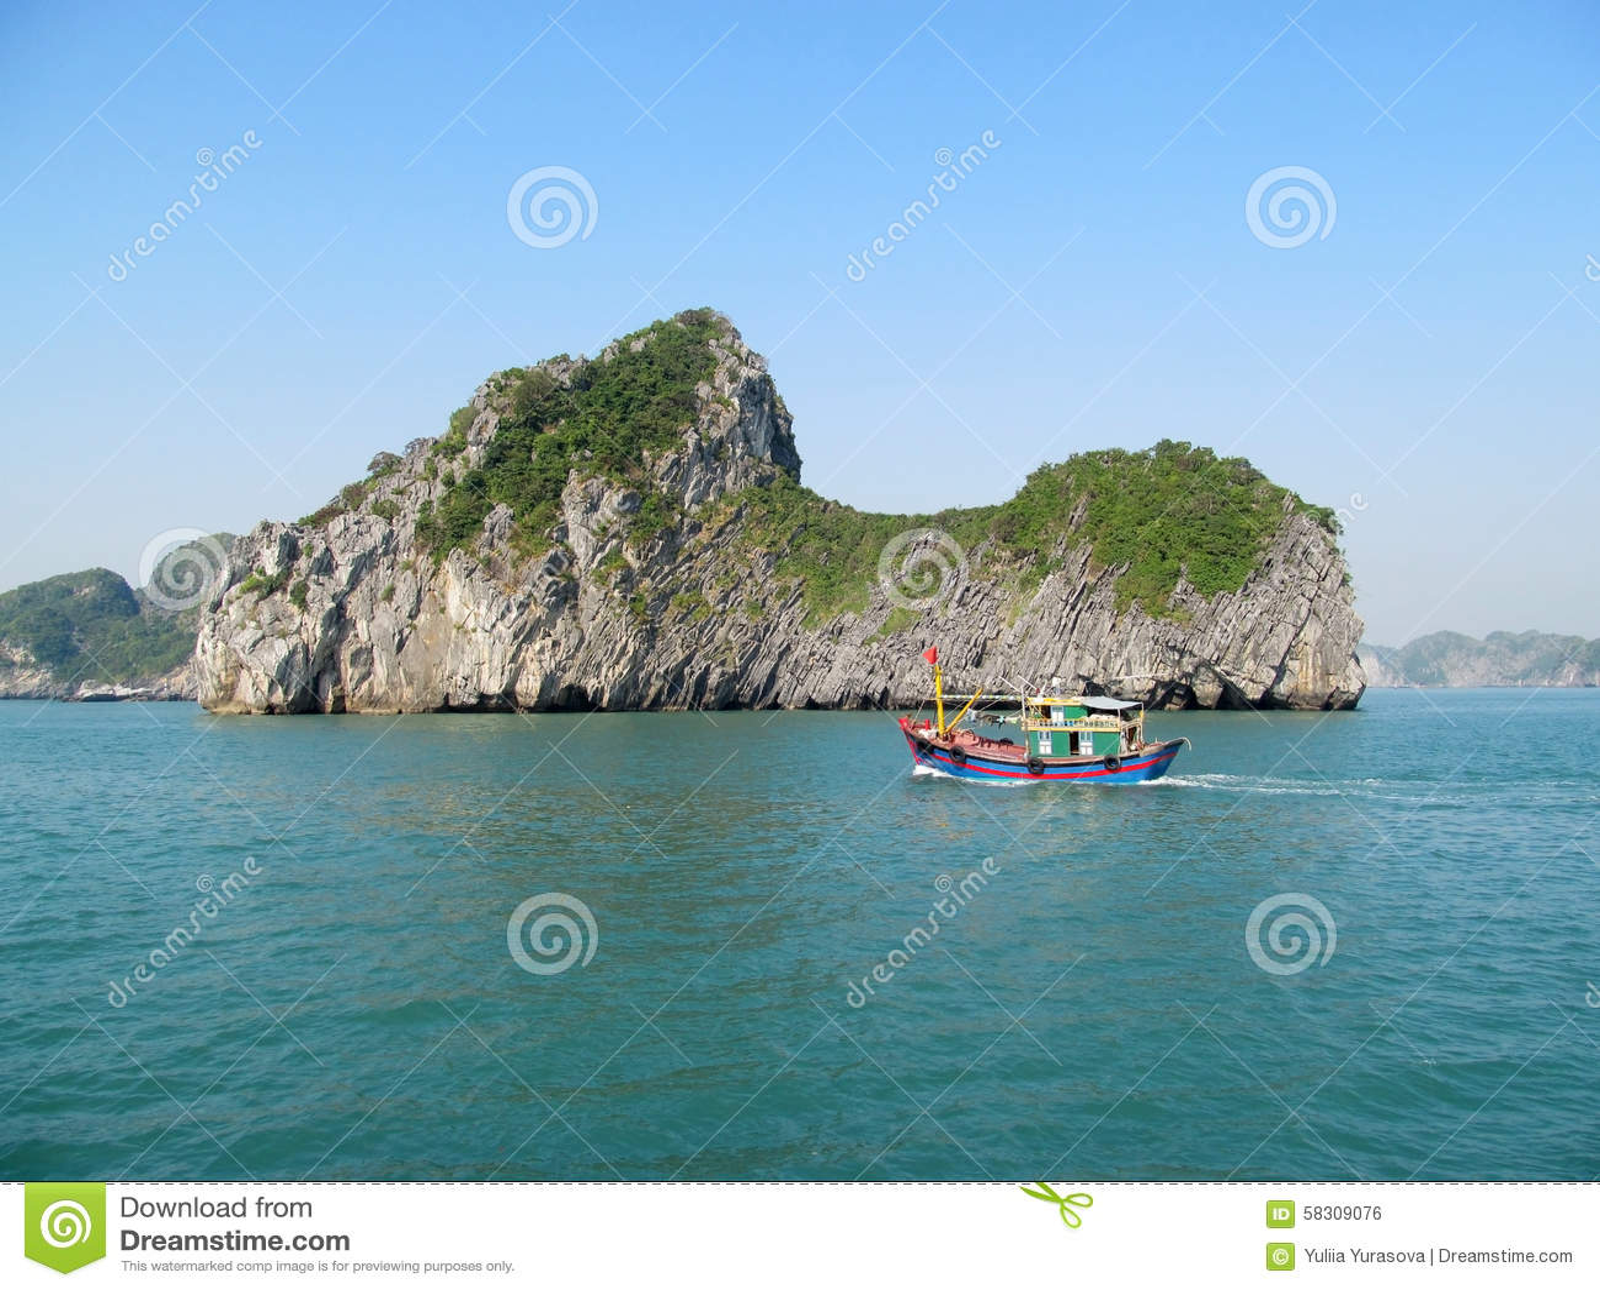 Boat passing scenic islands in the sea